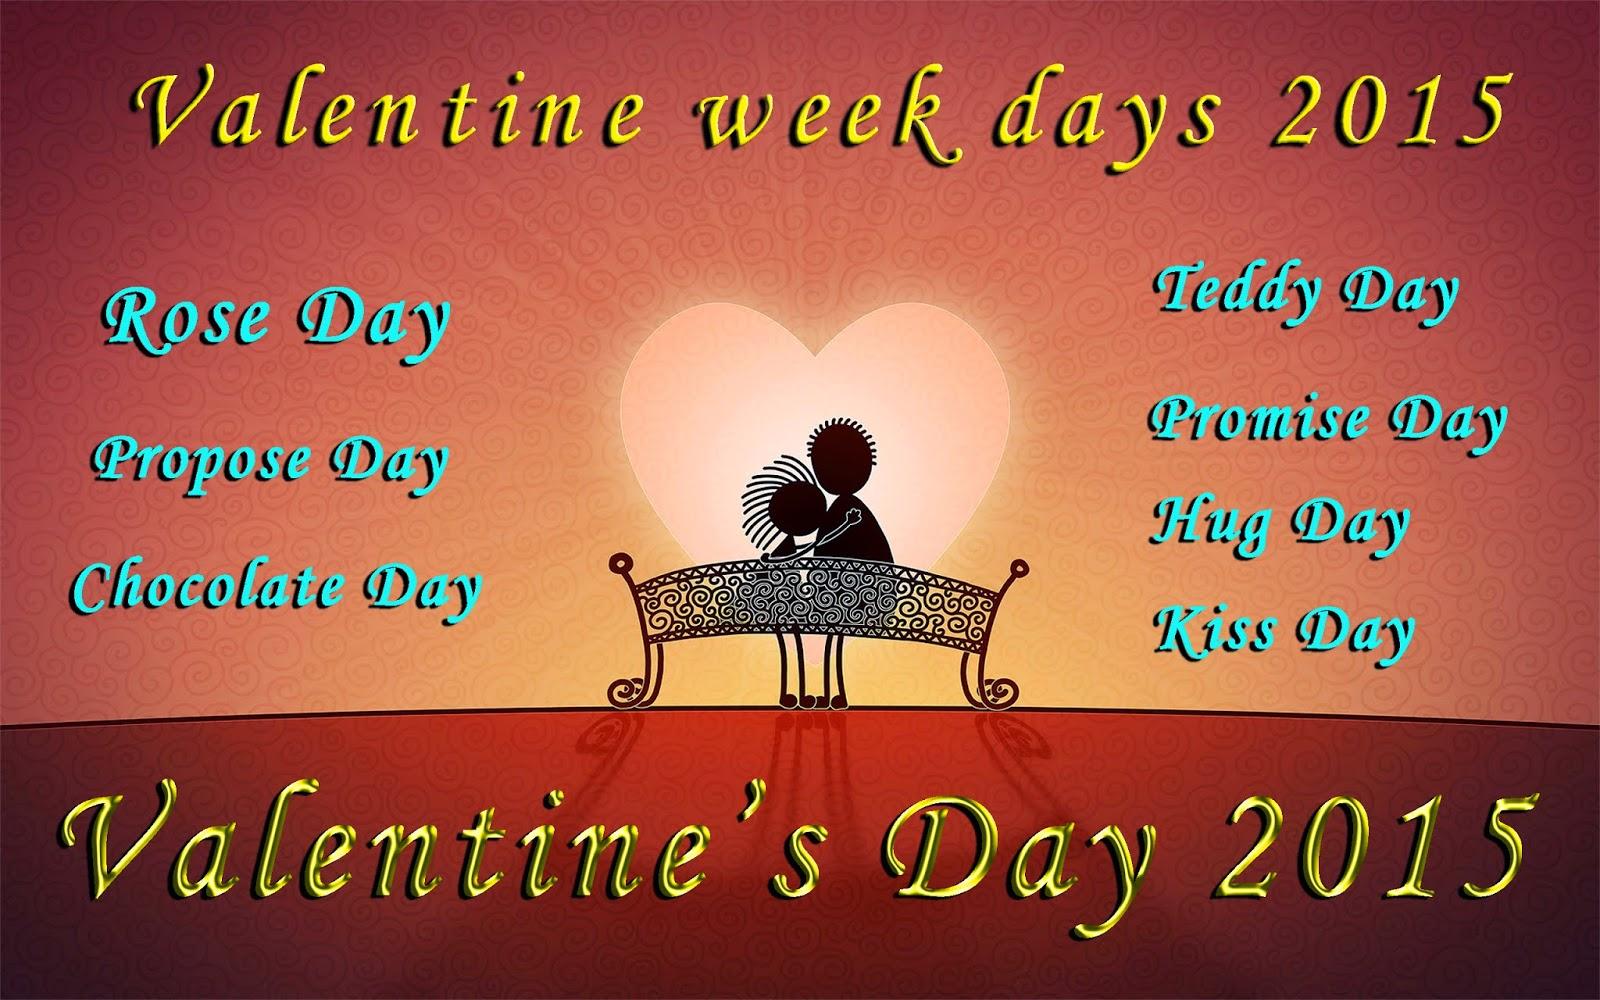 Valentines Week List 2017 Dates-Schedule Rose-Propose-Hug-Kiss-and ...